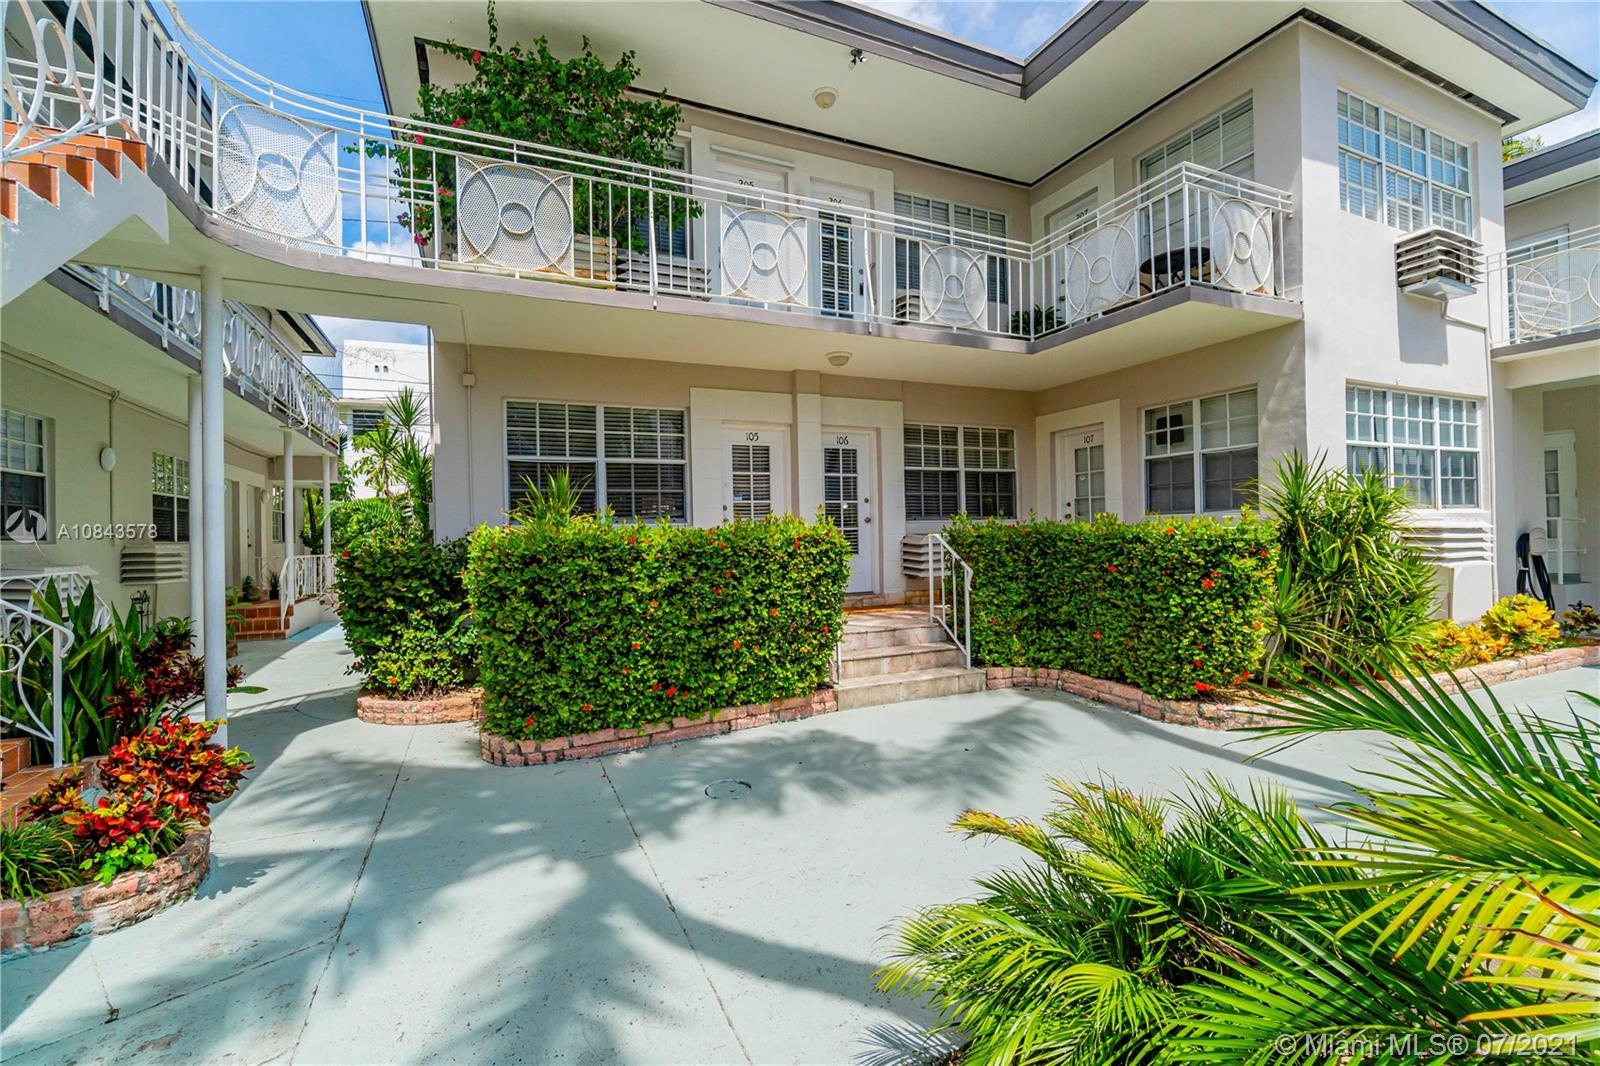 717 Espanola Way # 106, Miami Beach, Florida 33139, ,1 BathroomBathrooms,Residential,For Sale,717 Espanola Way # 106,A10843578